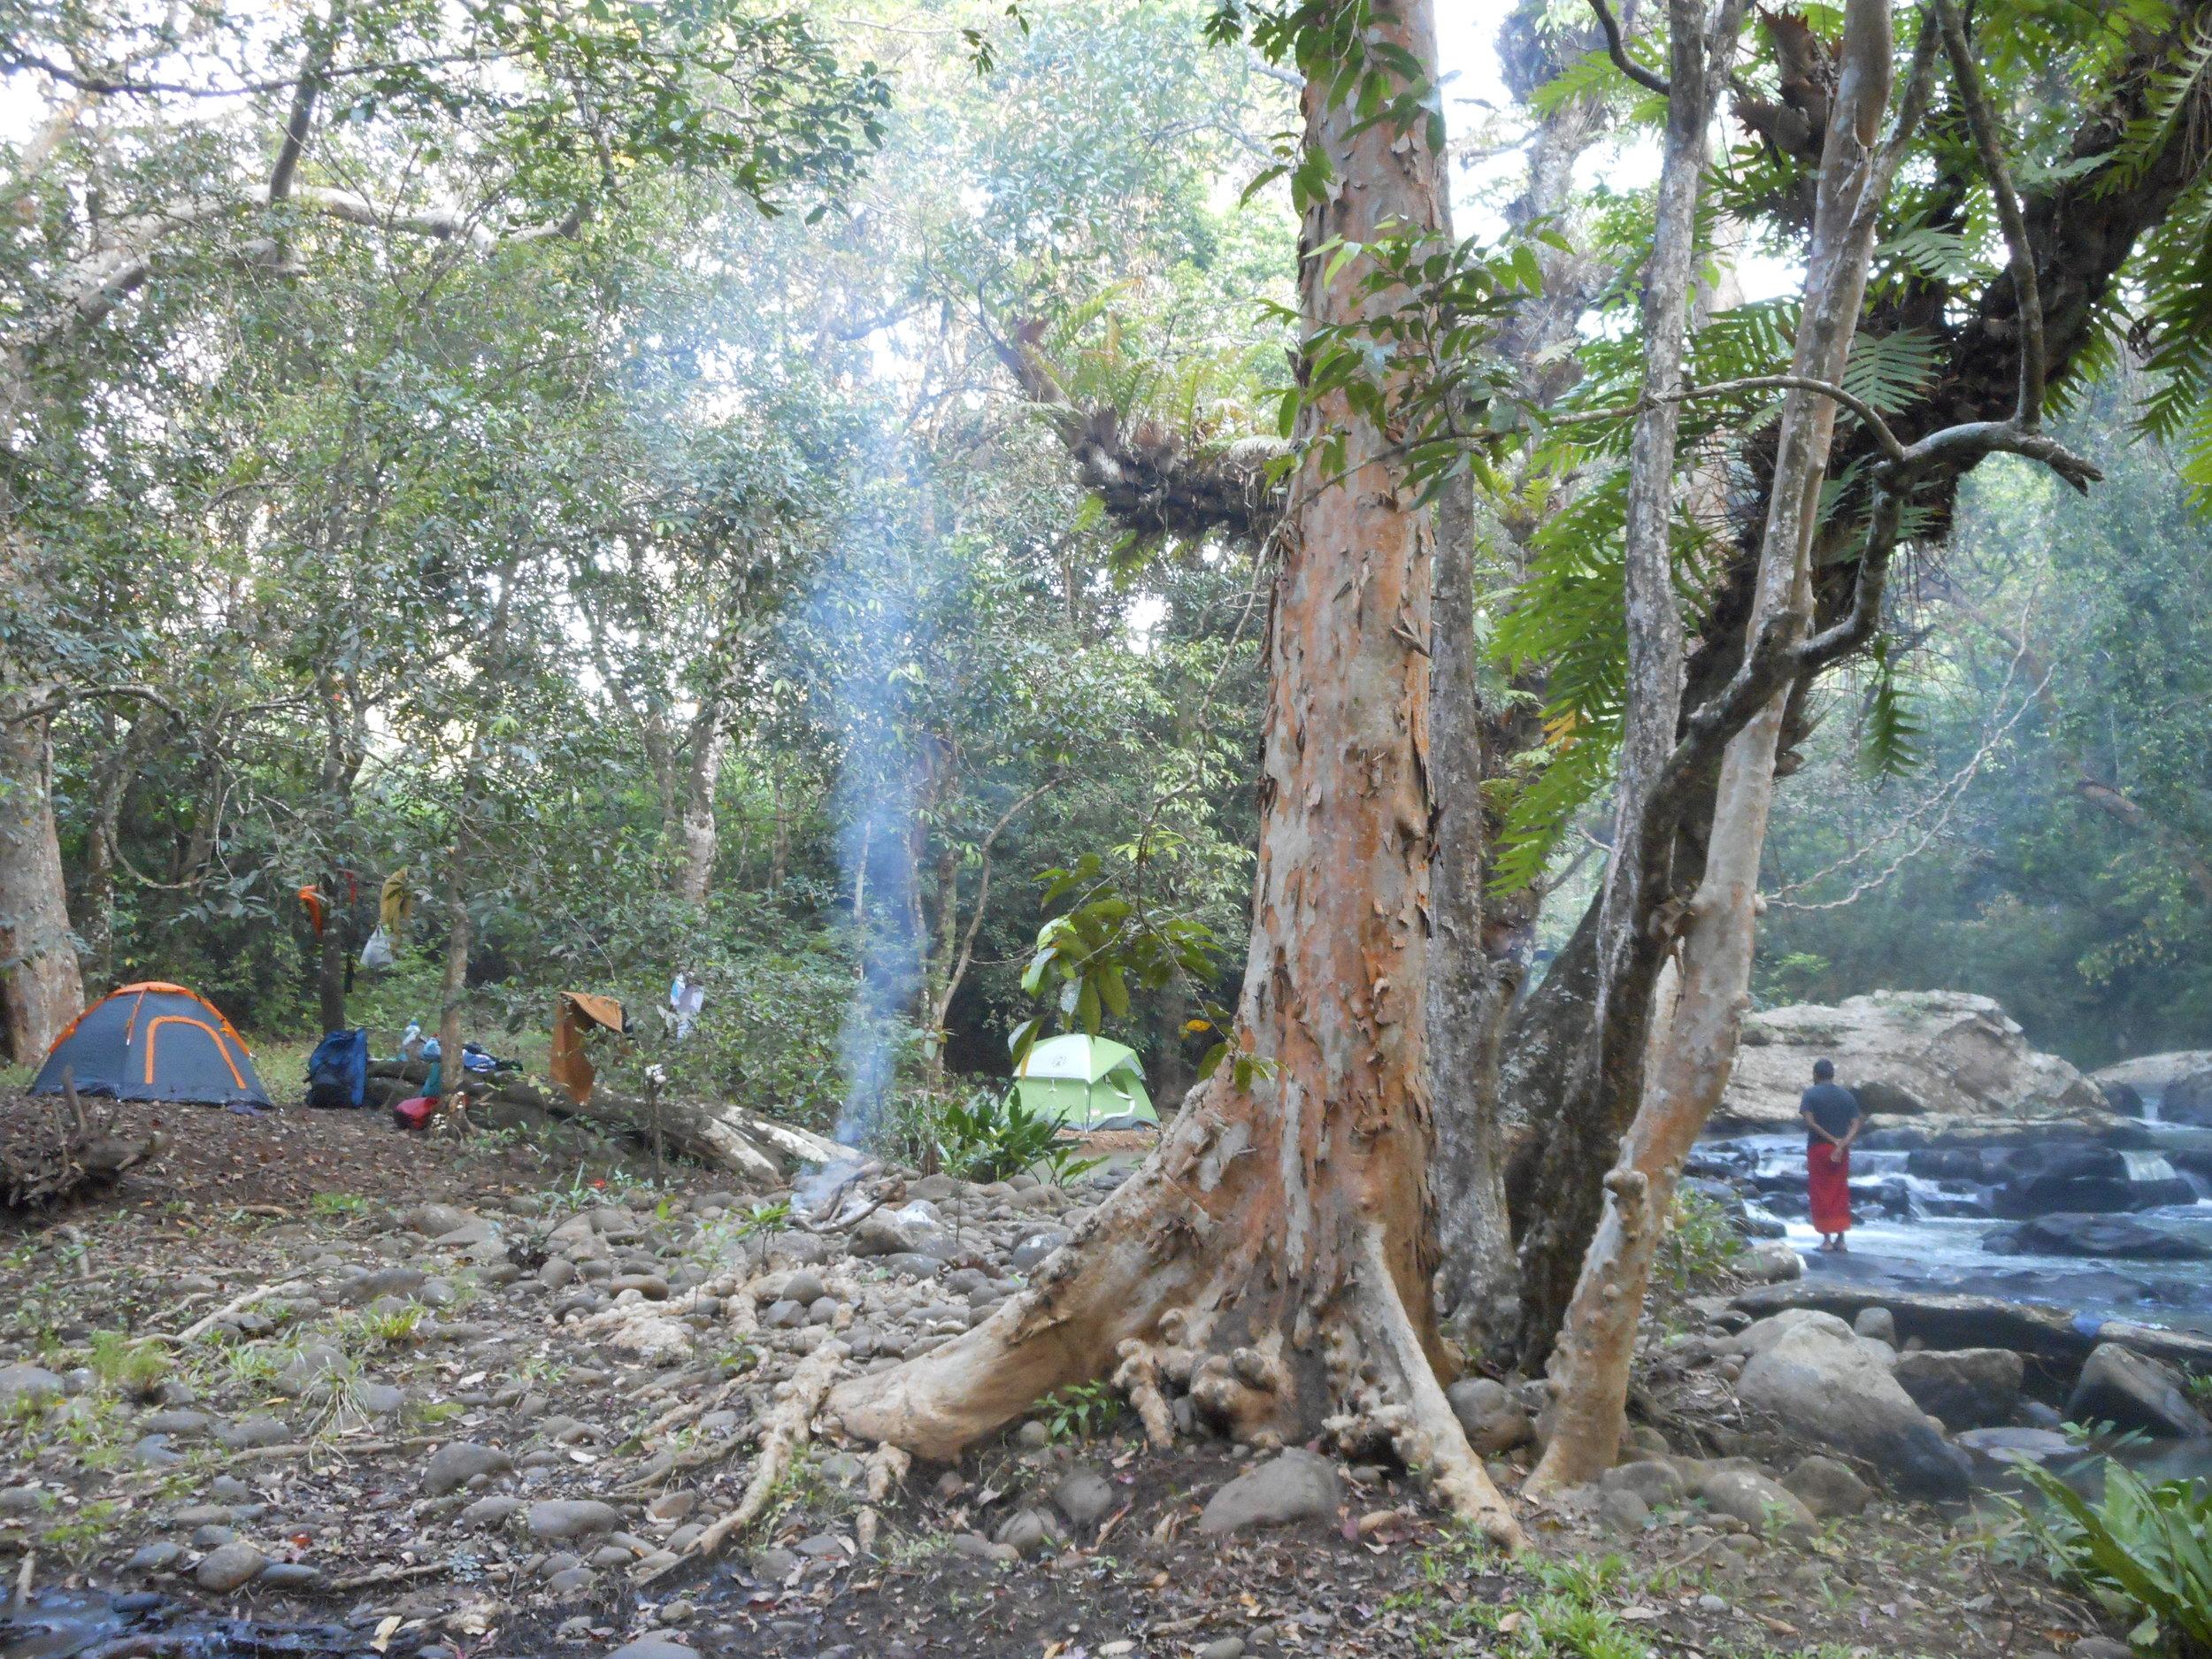 Camping and hiking trips Sri Lanka, Wilderness Journeys